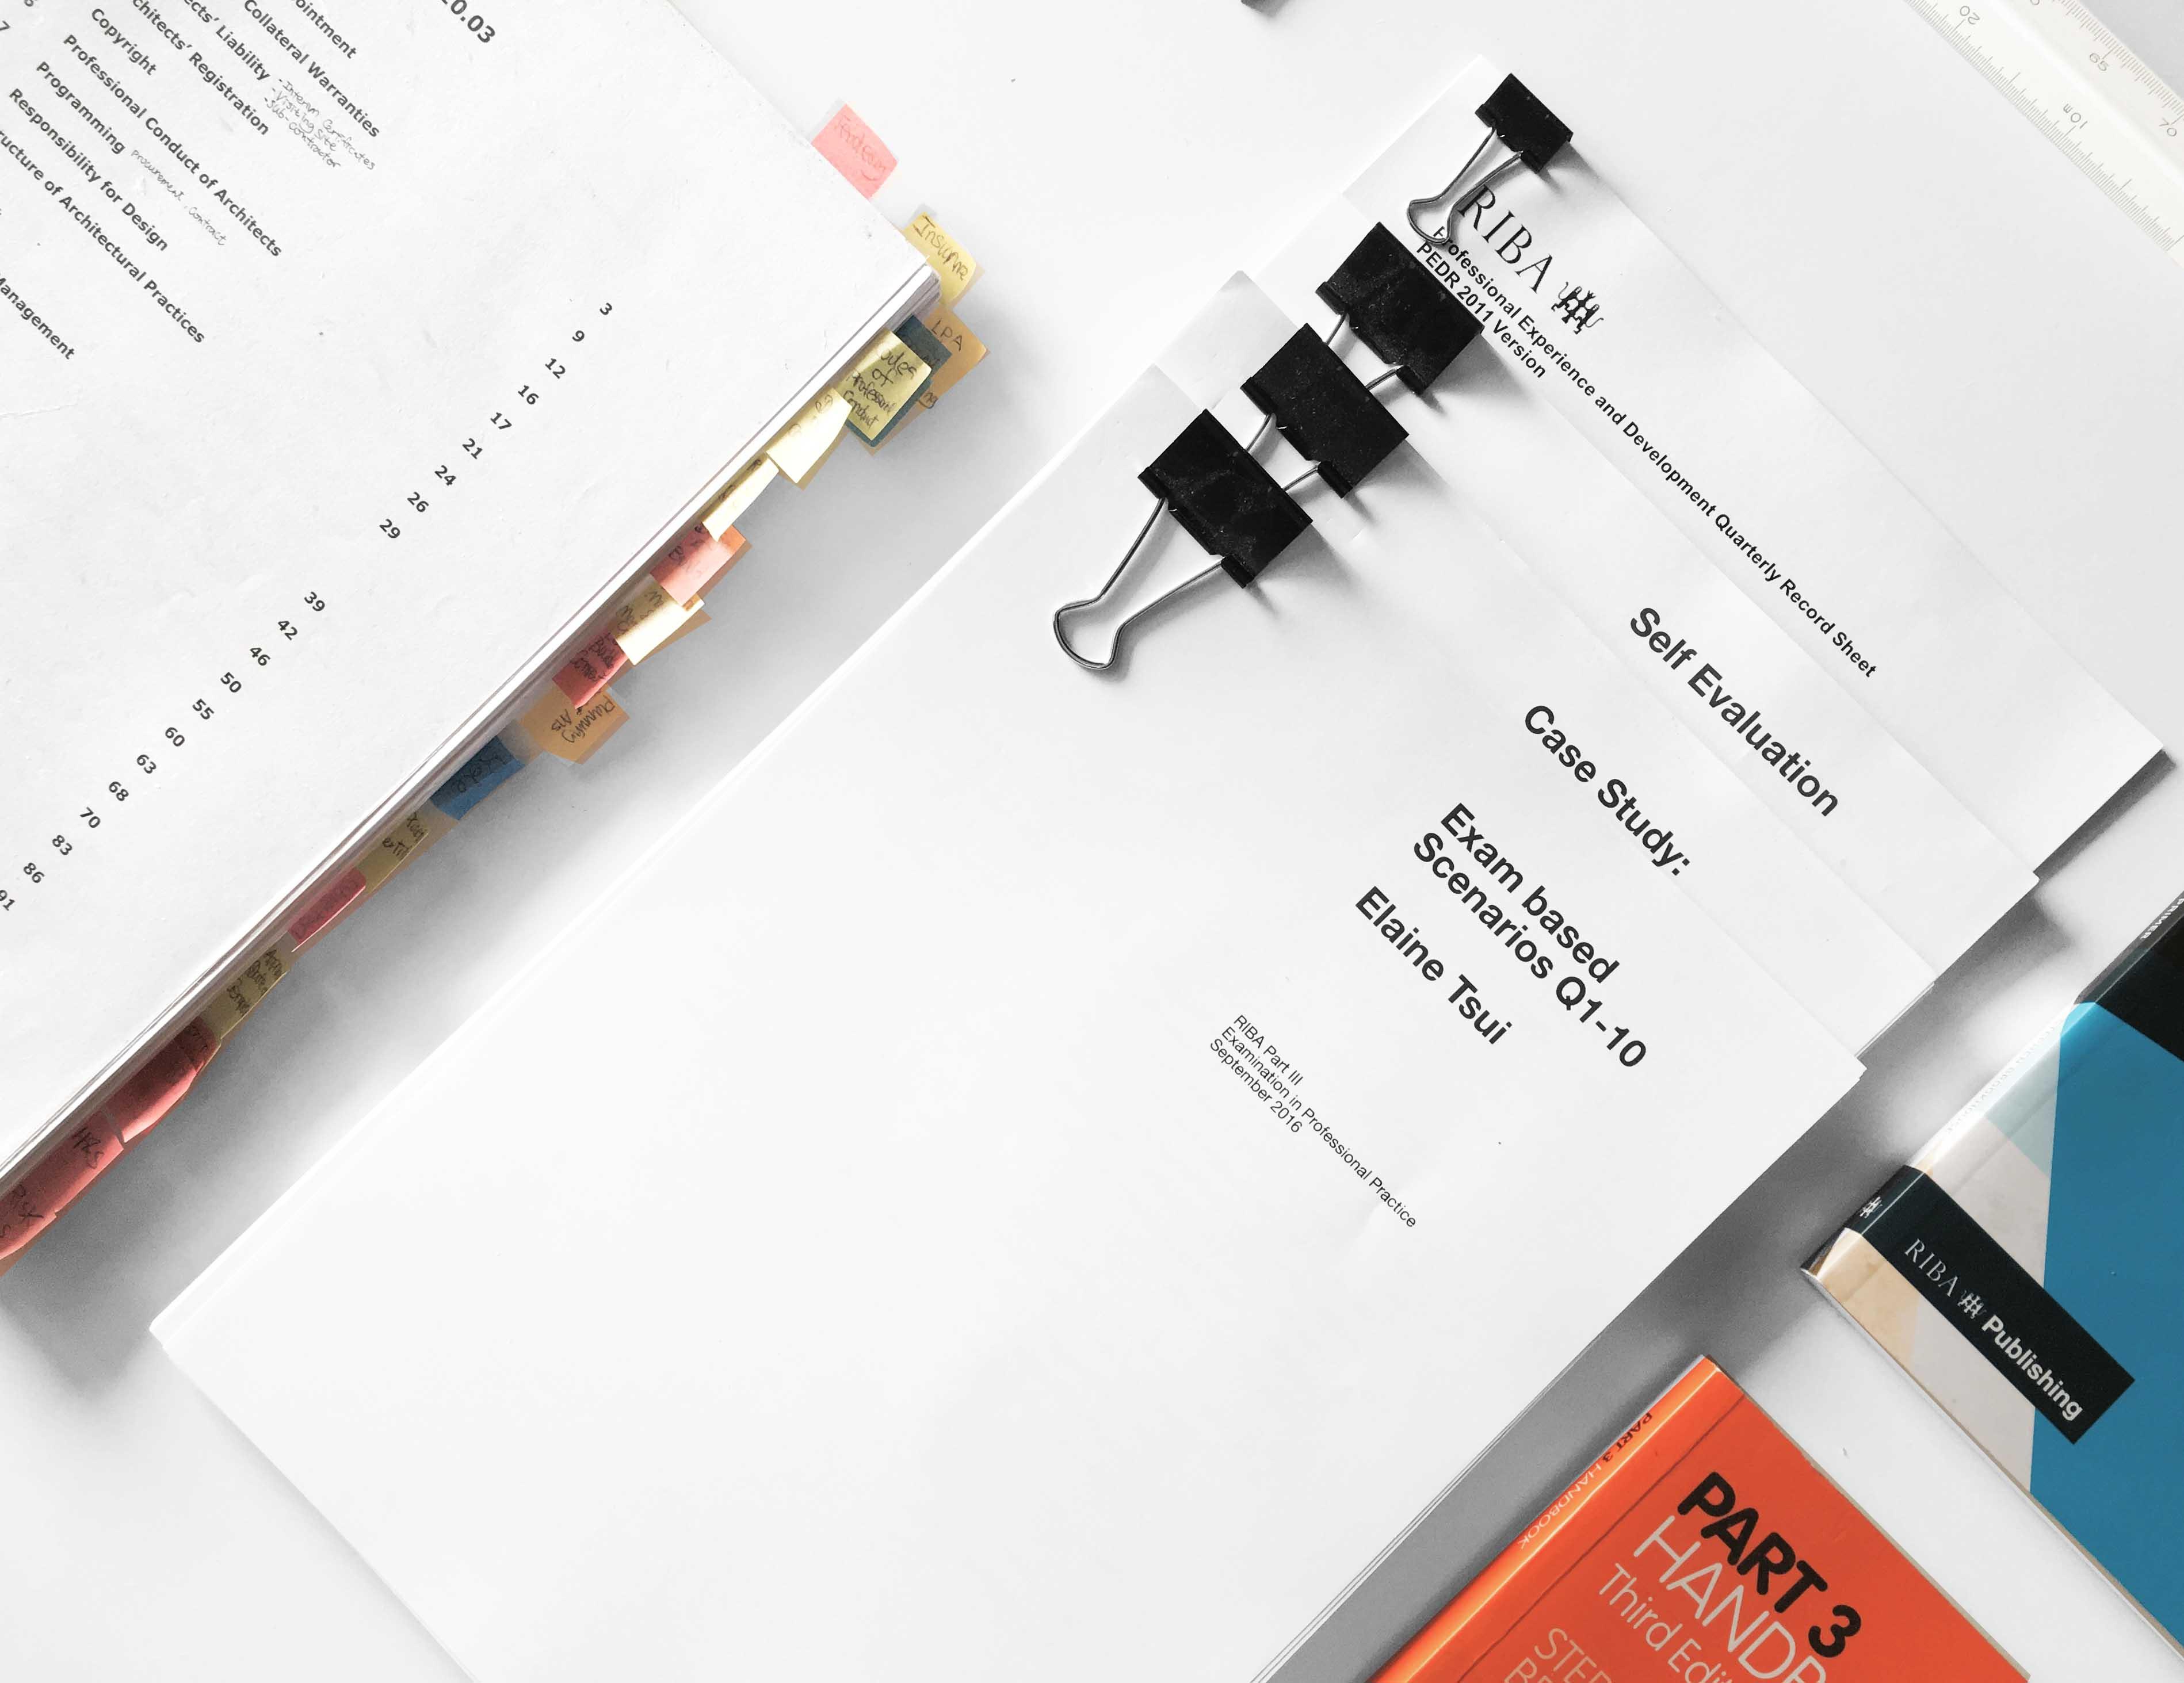 Elaine Tsui - Becoming an Architect   My RIBA Part 3 Exam